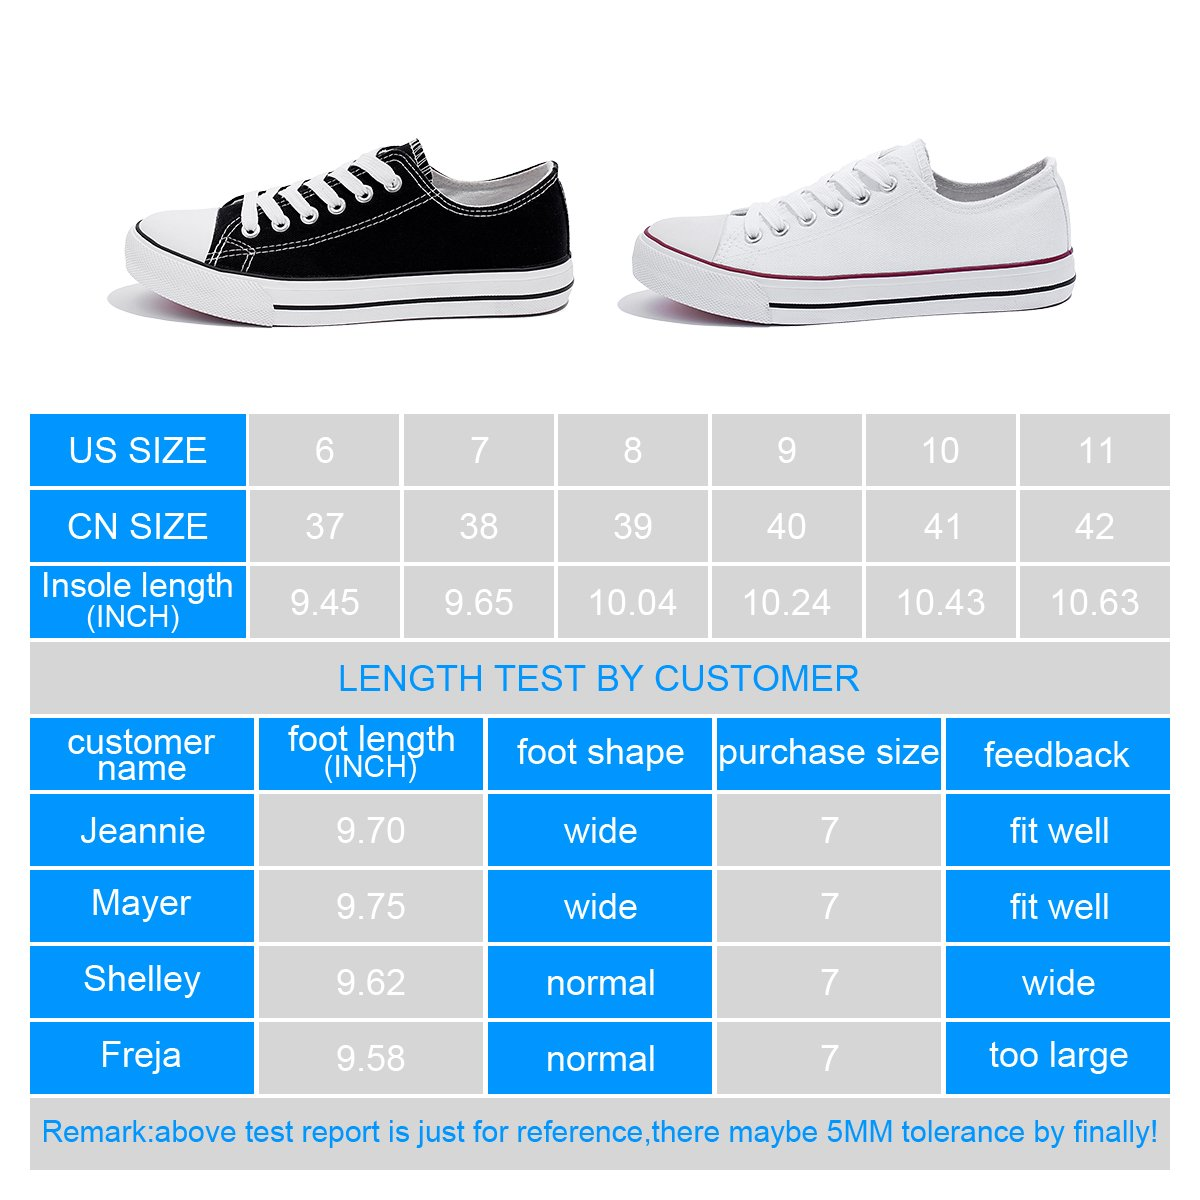 AOMAIS Womens Canvas Shoes Sneaker Low Top Lace up Fashion Walking Shoes (US7, white1) … by AOMAIS (Image #8)